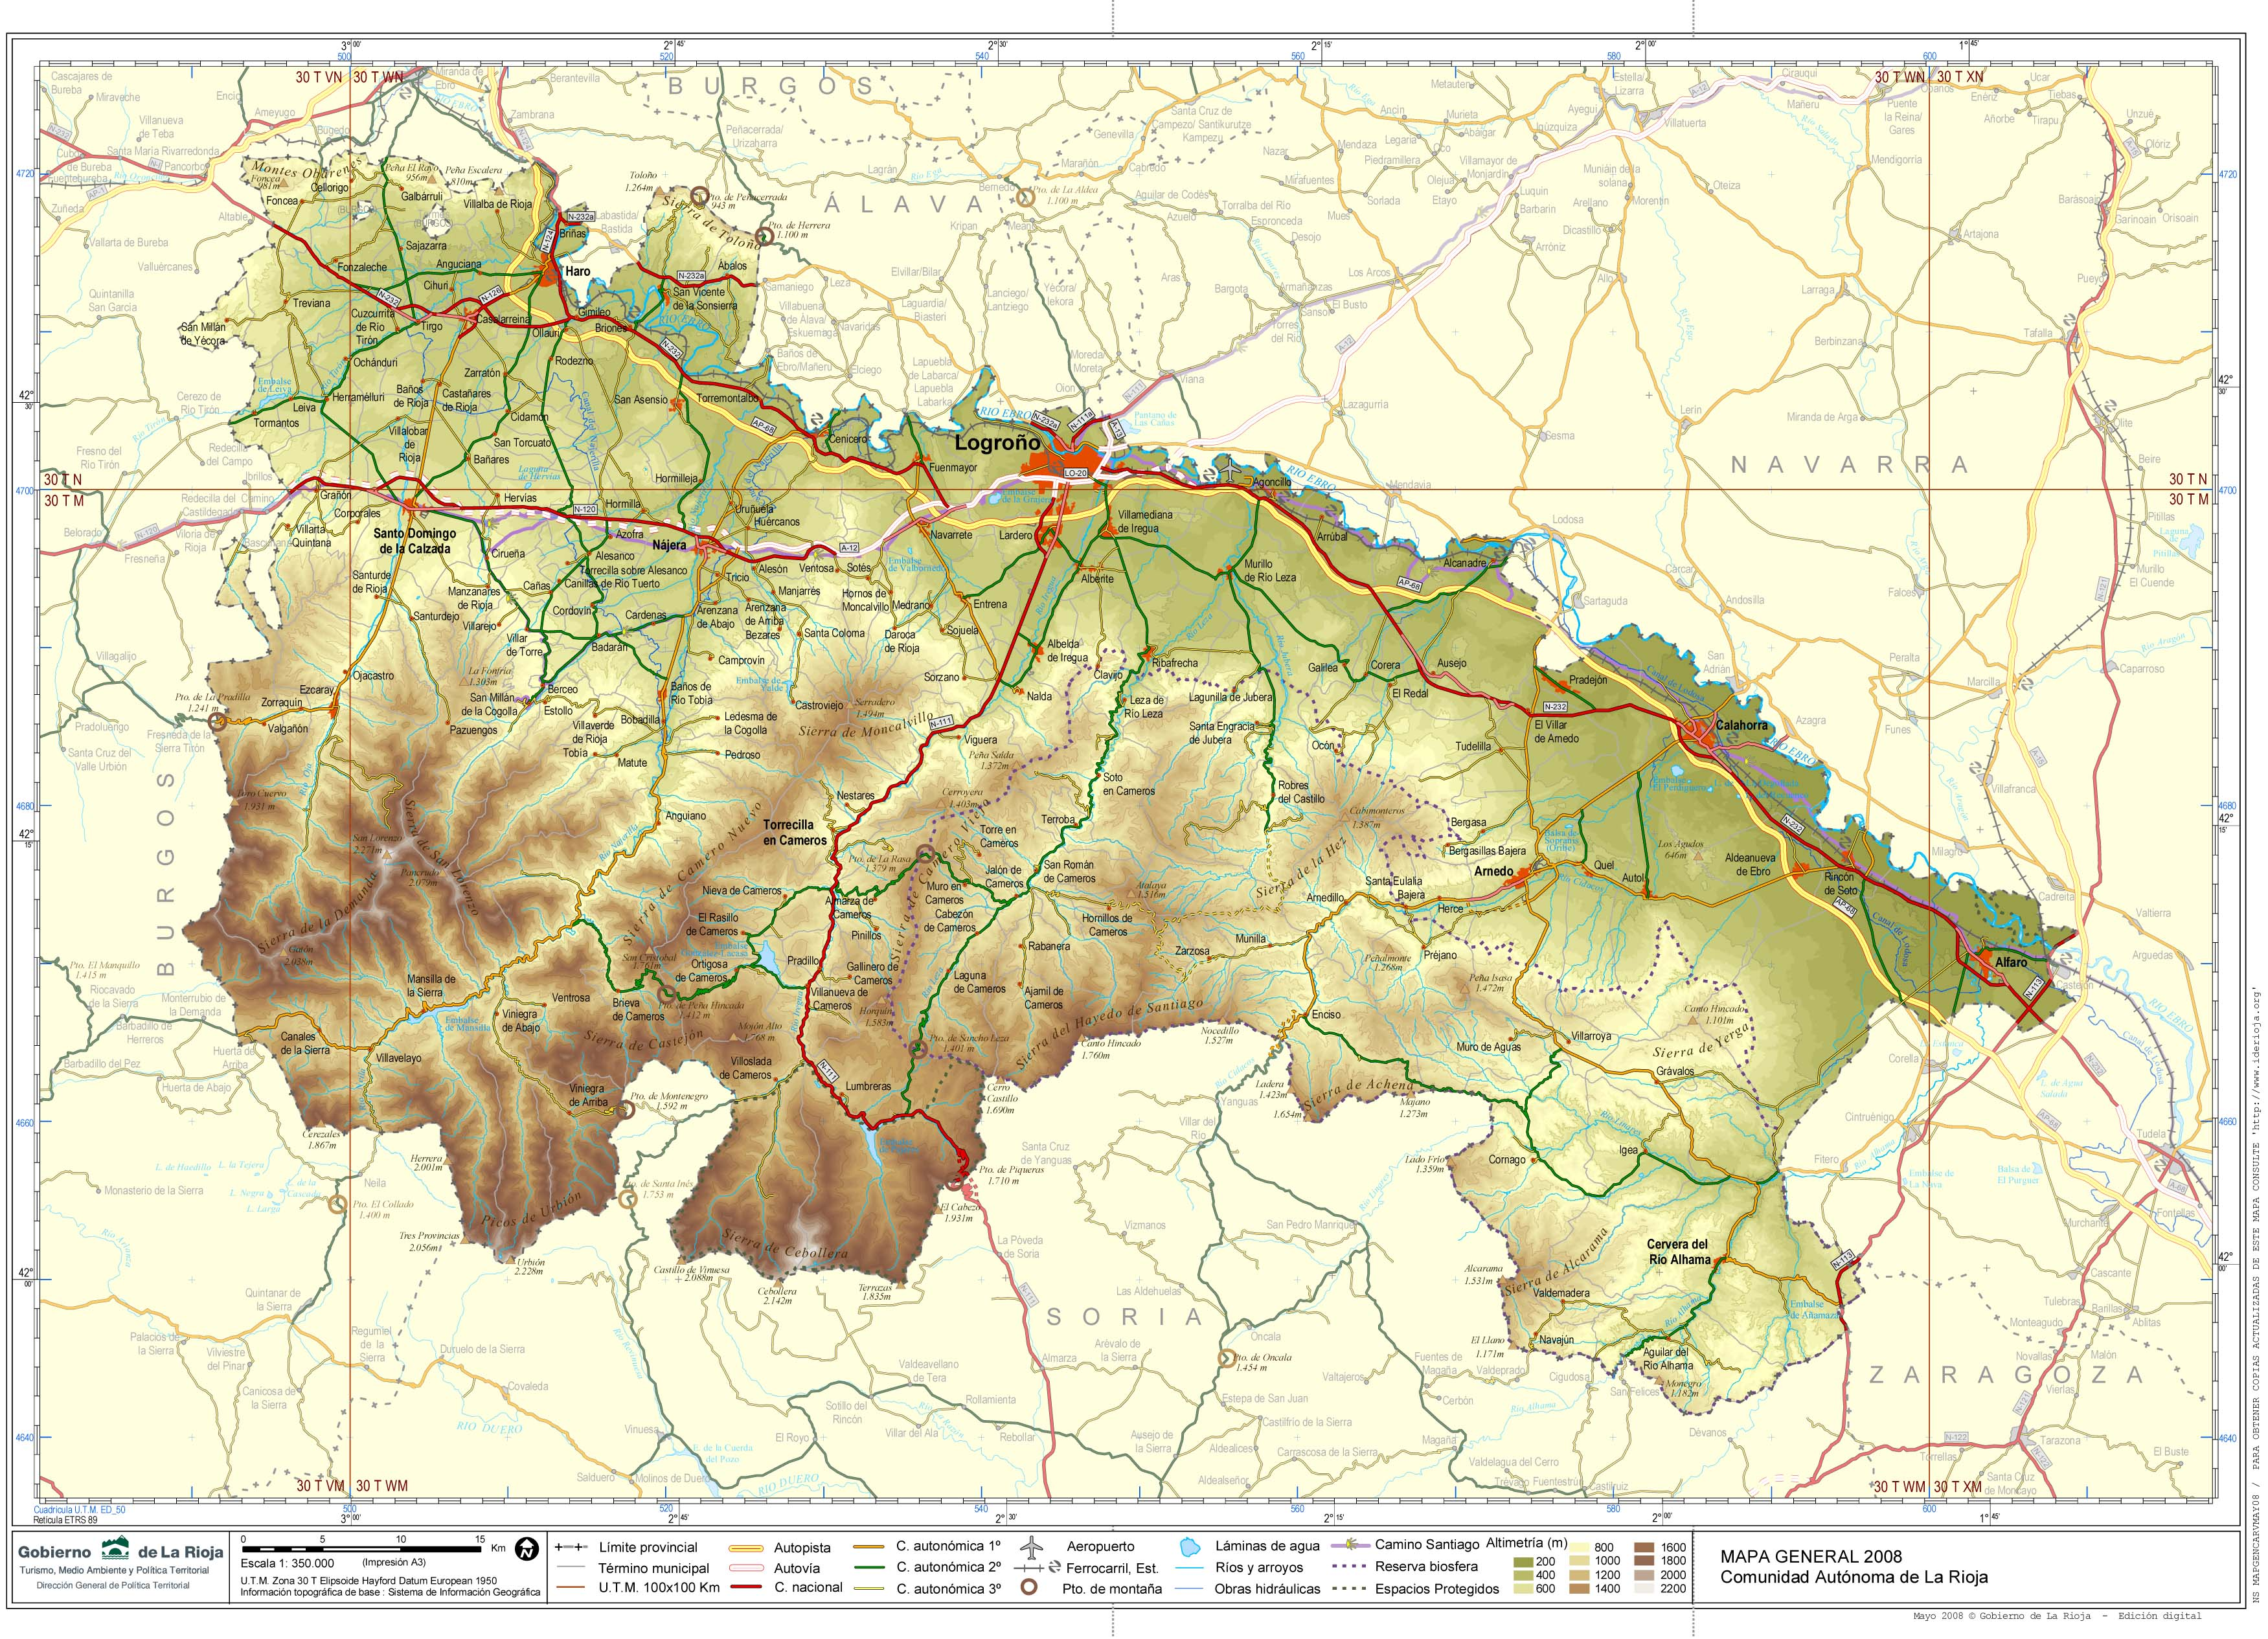 La Rioja map 2008